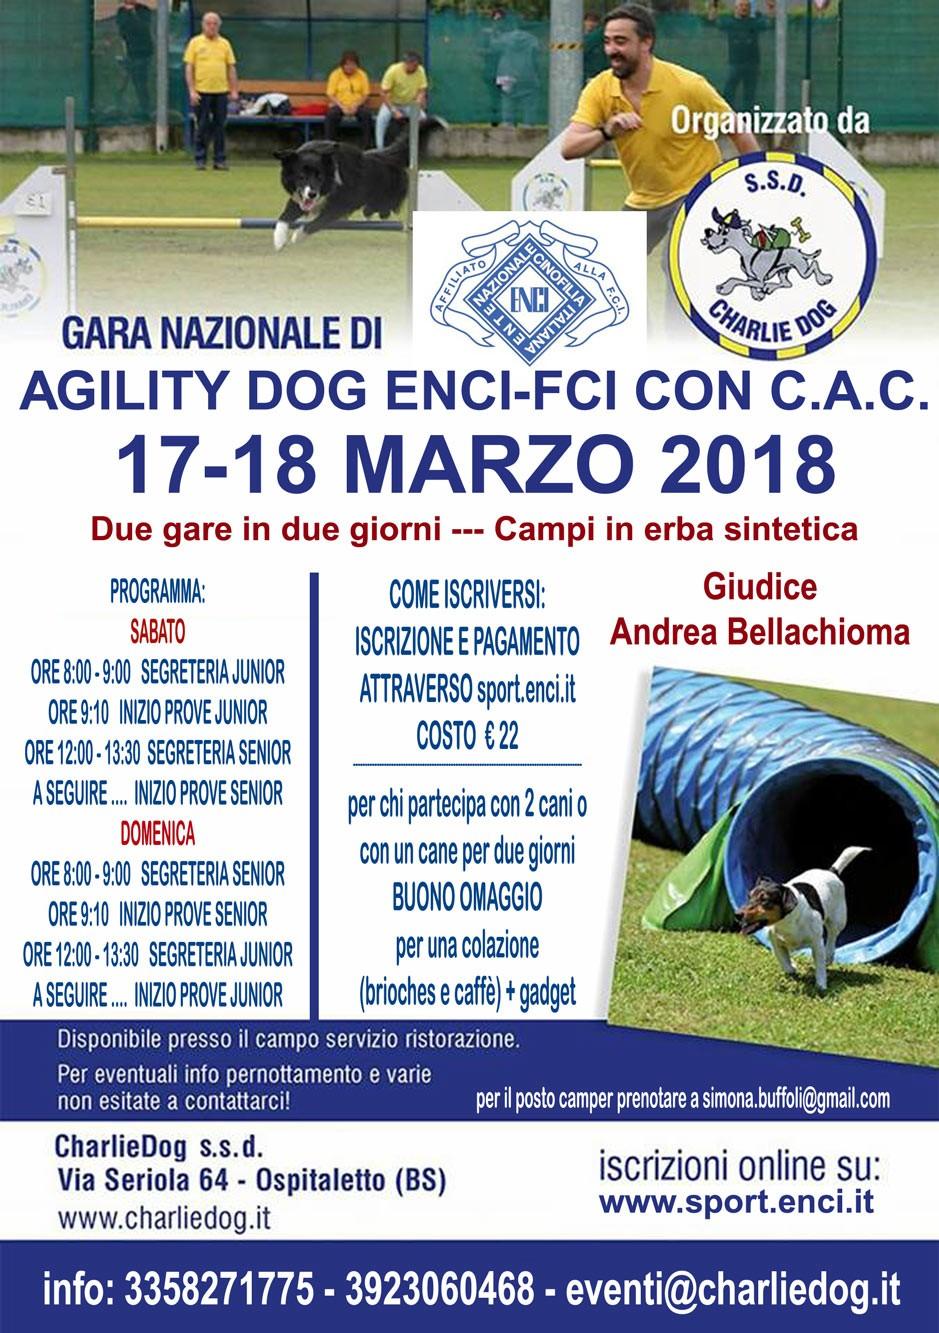 GARA NAZIONALE DI AGILITY CHARLIE DOG 18 MARZO